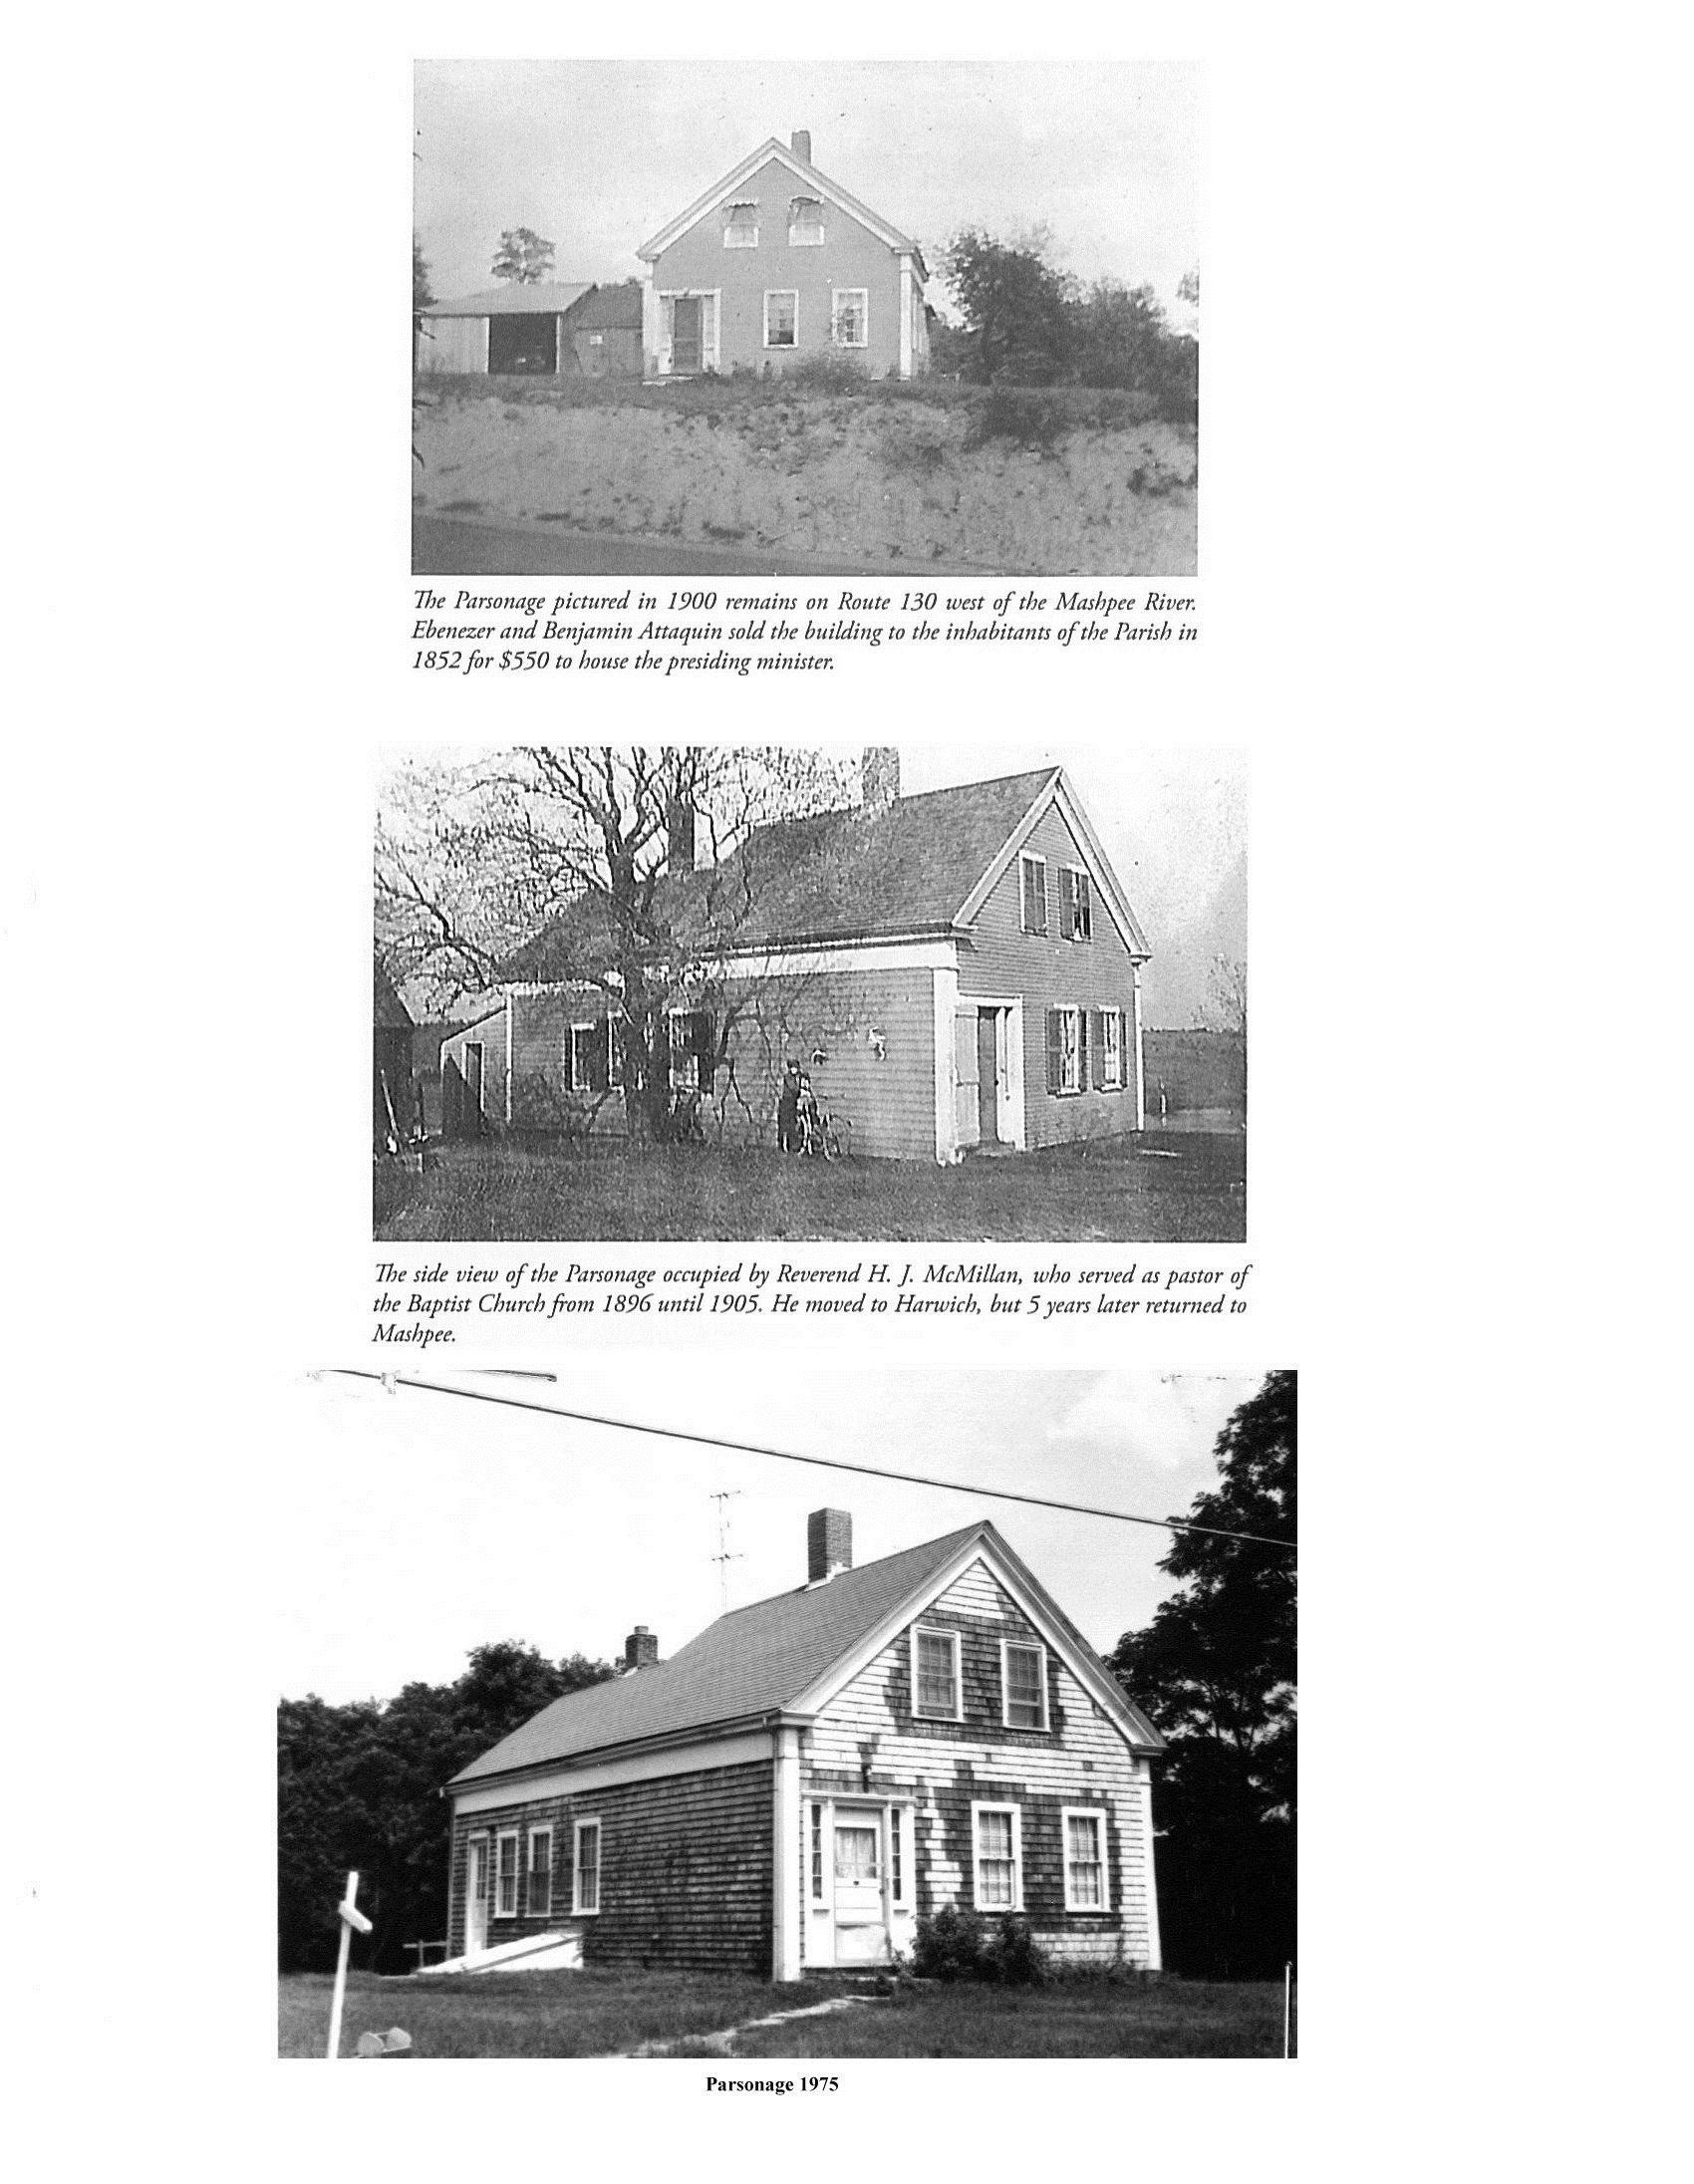 Mashpee parsonage images 1900_1975 (003).jpg